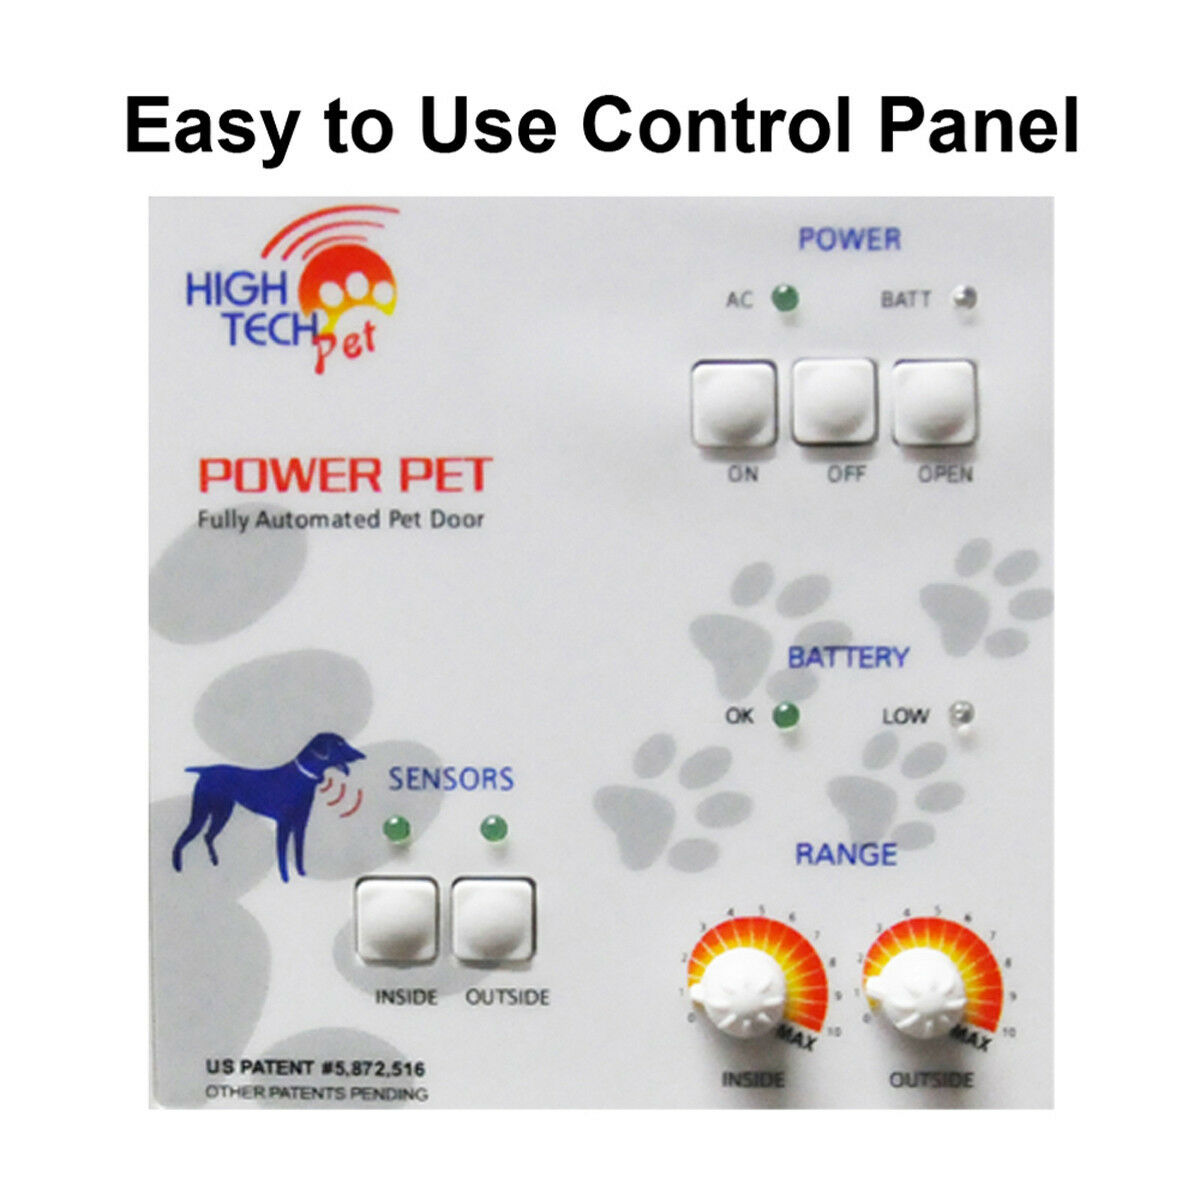 Power Pet  Md Automt'c Sldng Gls LowE Pet Door-FACTORY Door-FACTORY Door-FACTORY DIRECT From HIGH TECH PET 860012